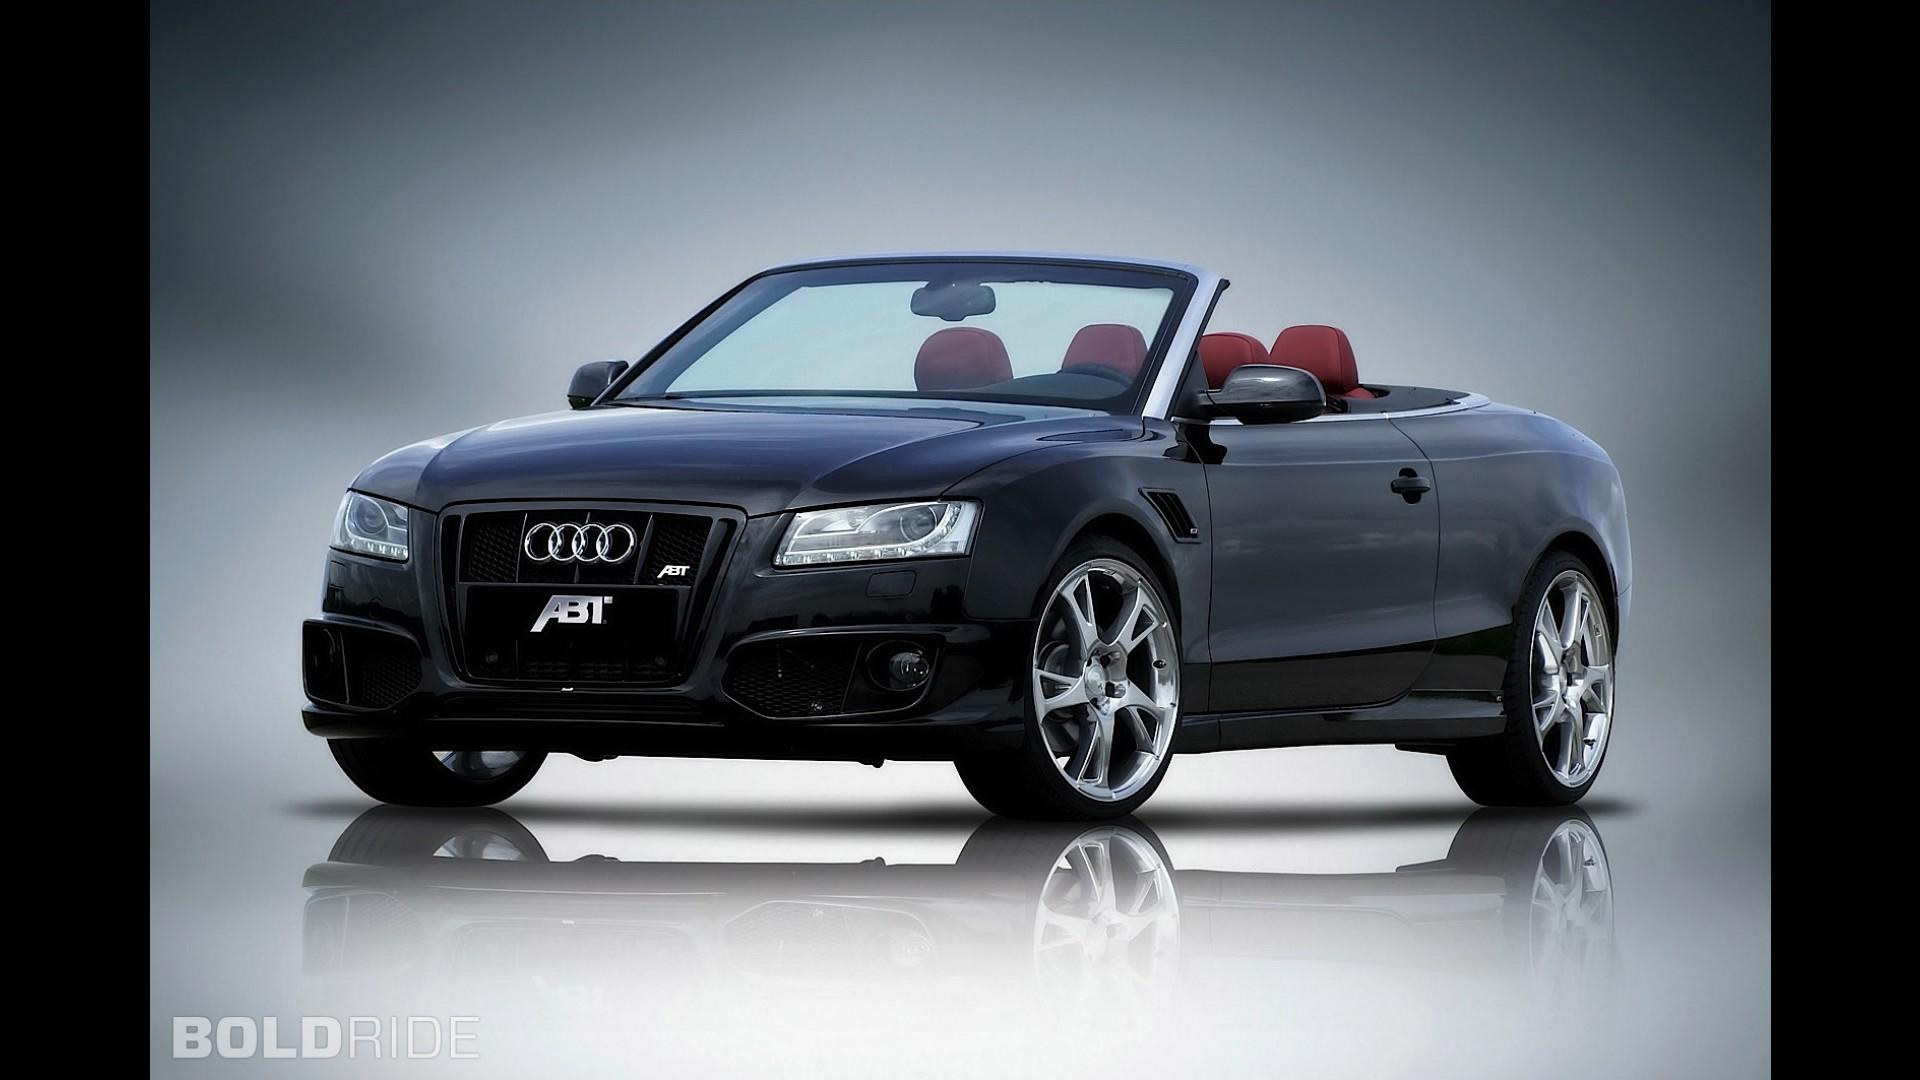 ABT Audi AS5 Cabrio